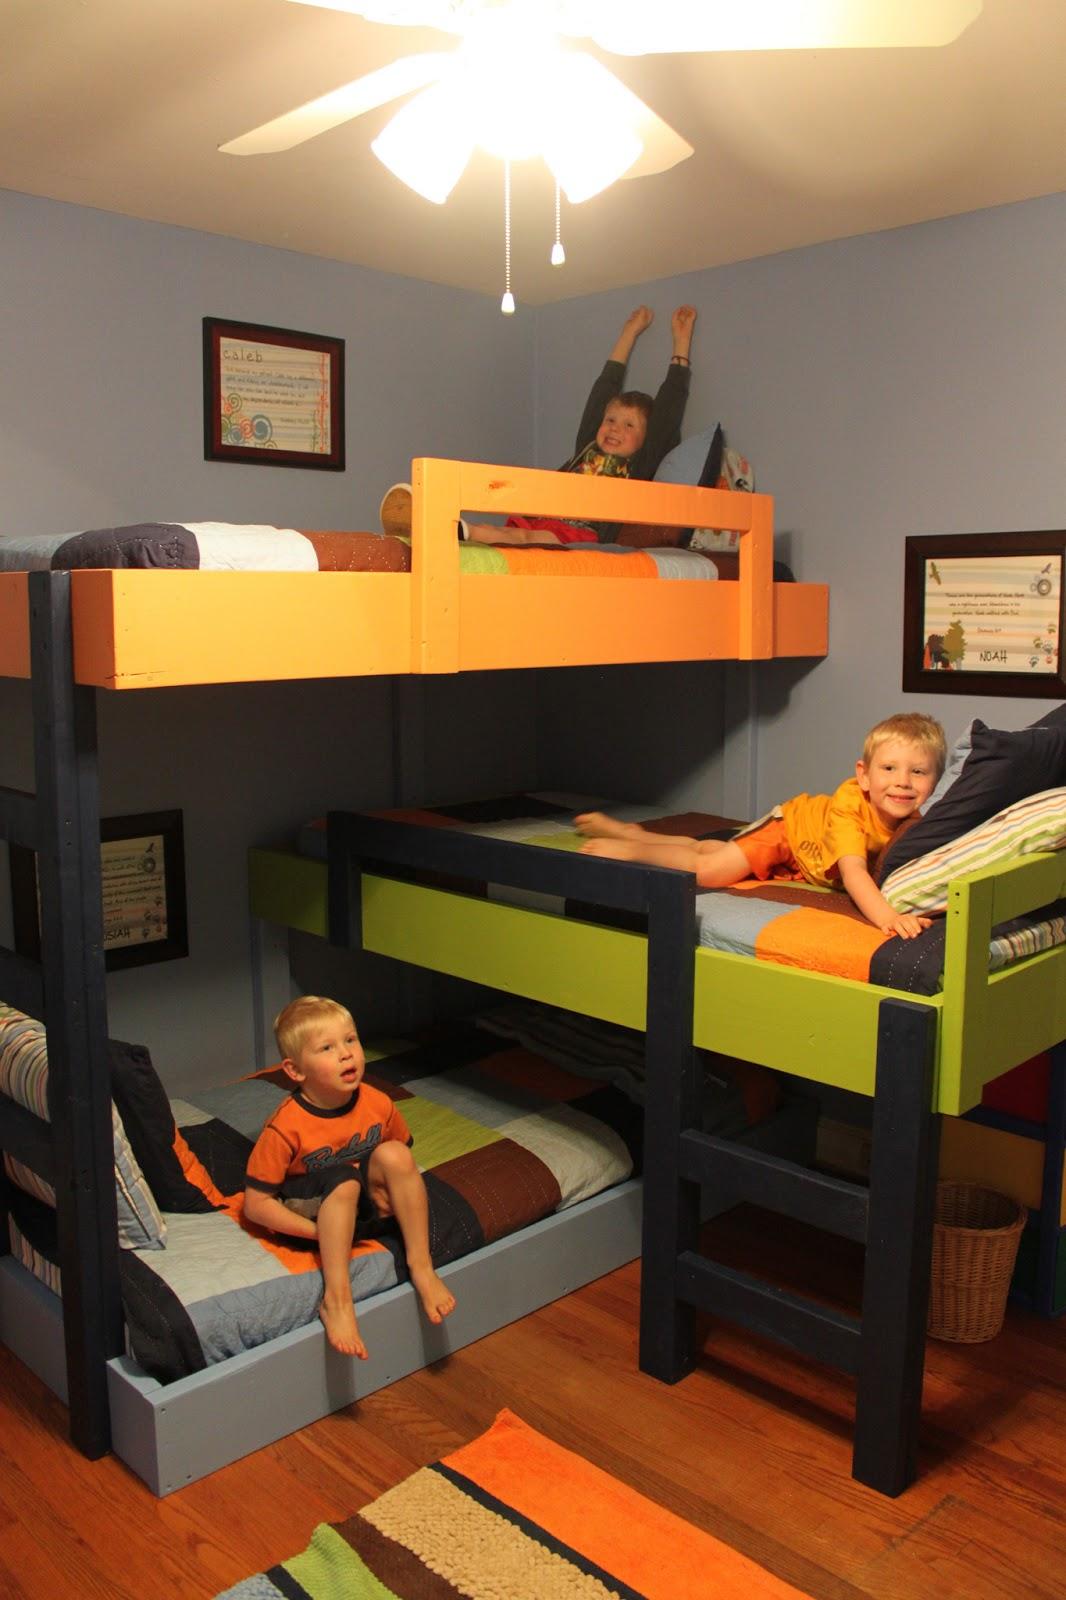 little things triple bunk beds and hardwood floors. Black Bedroom Furniture Sets. Home Design Ideas